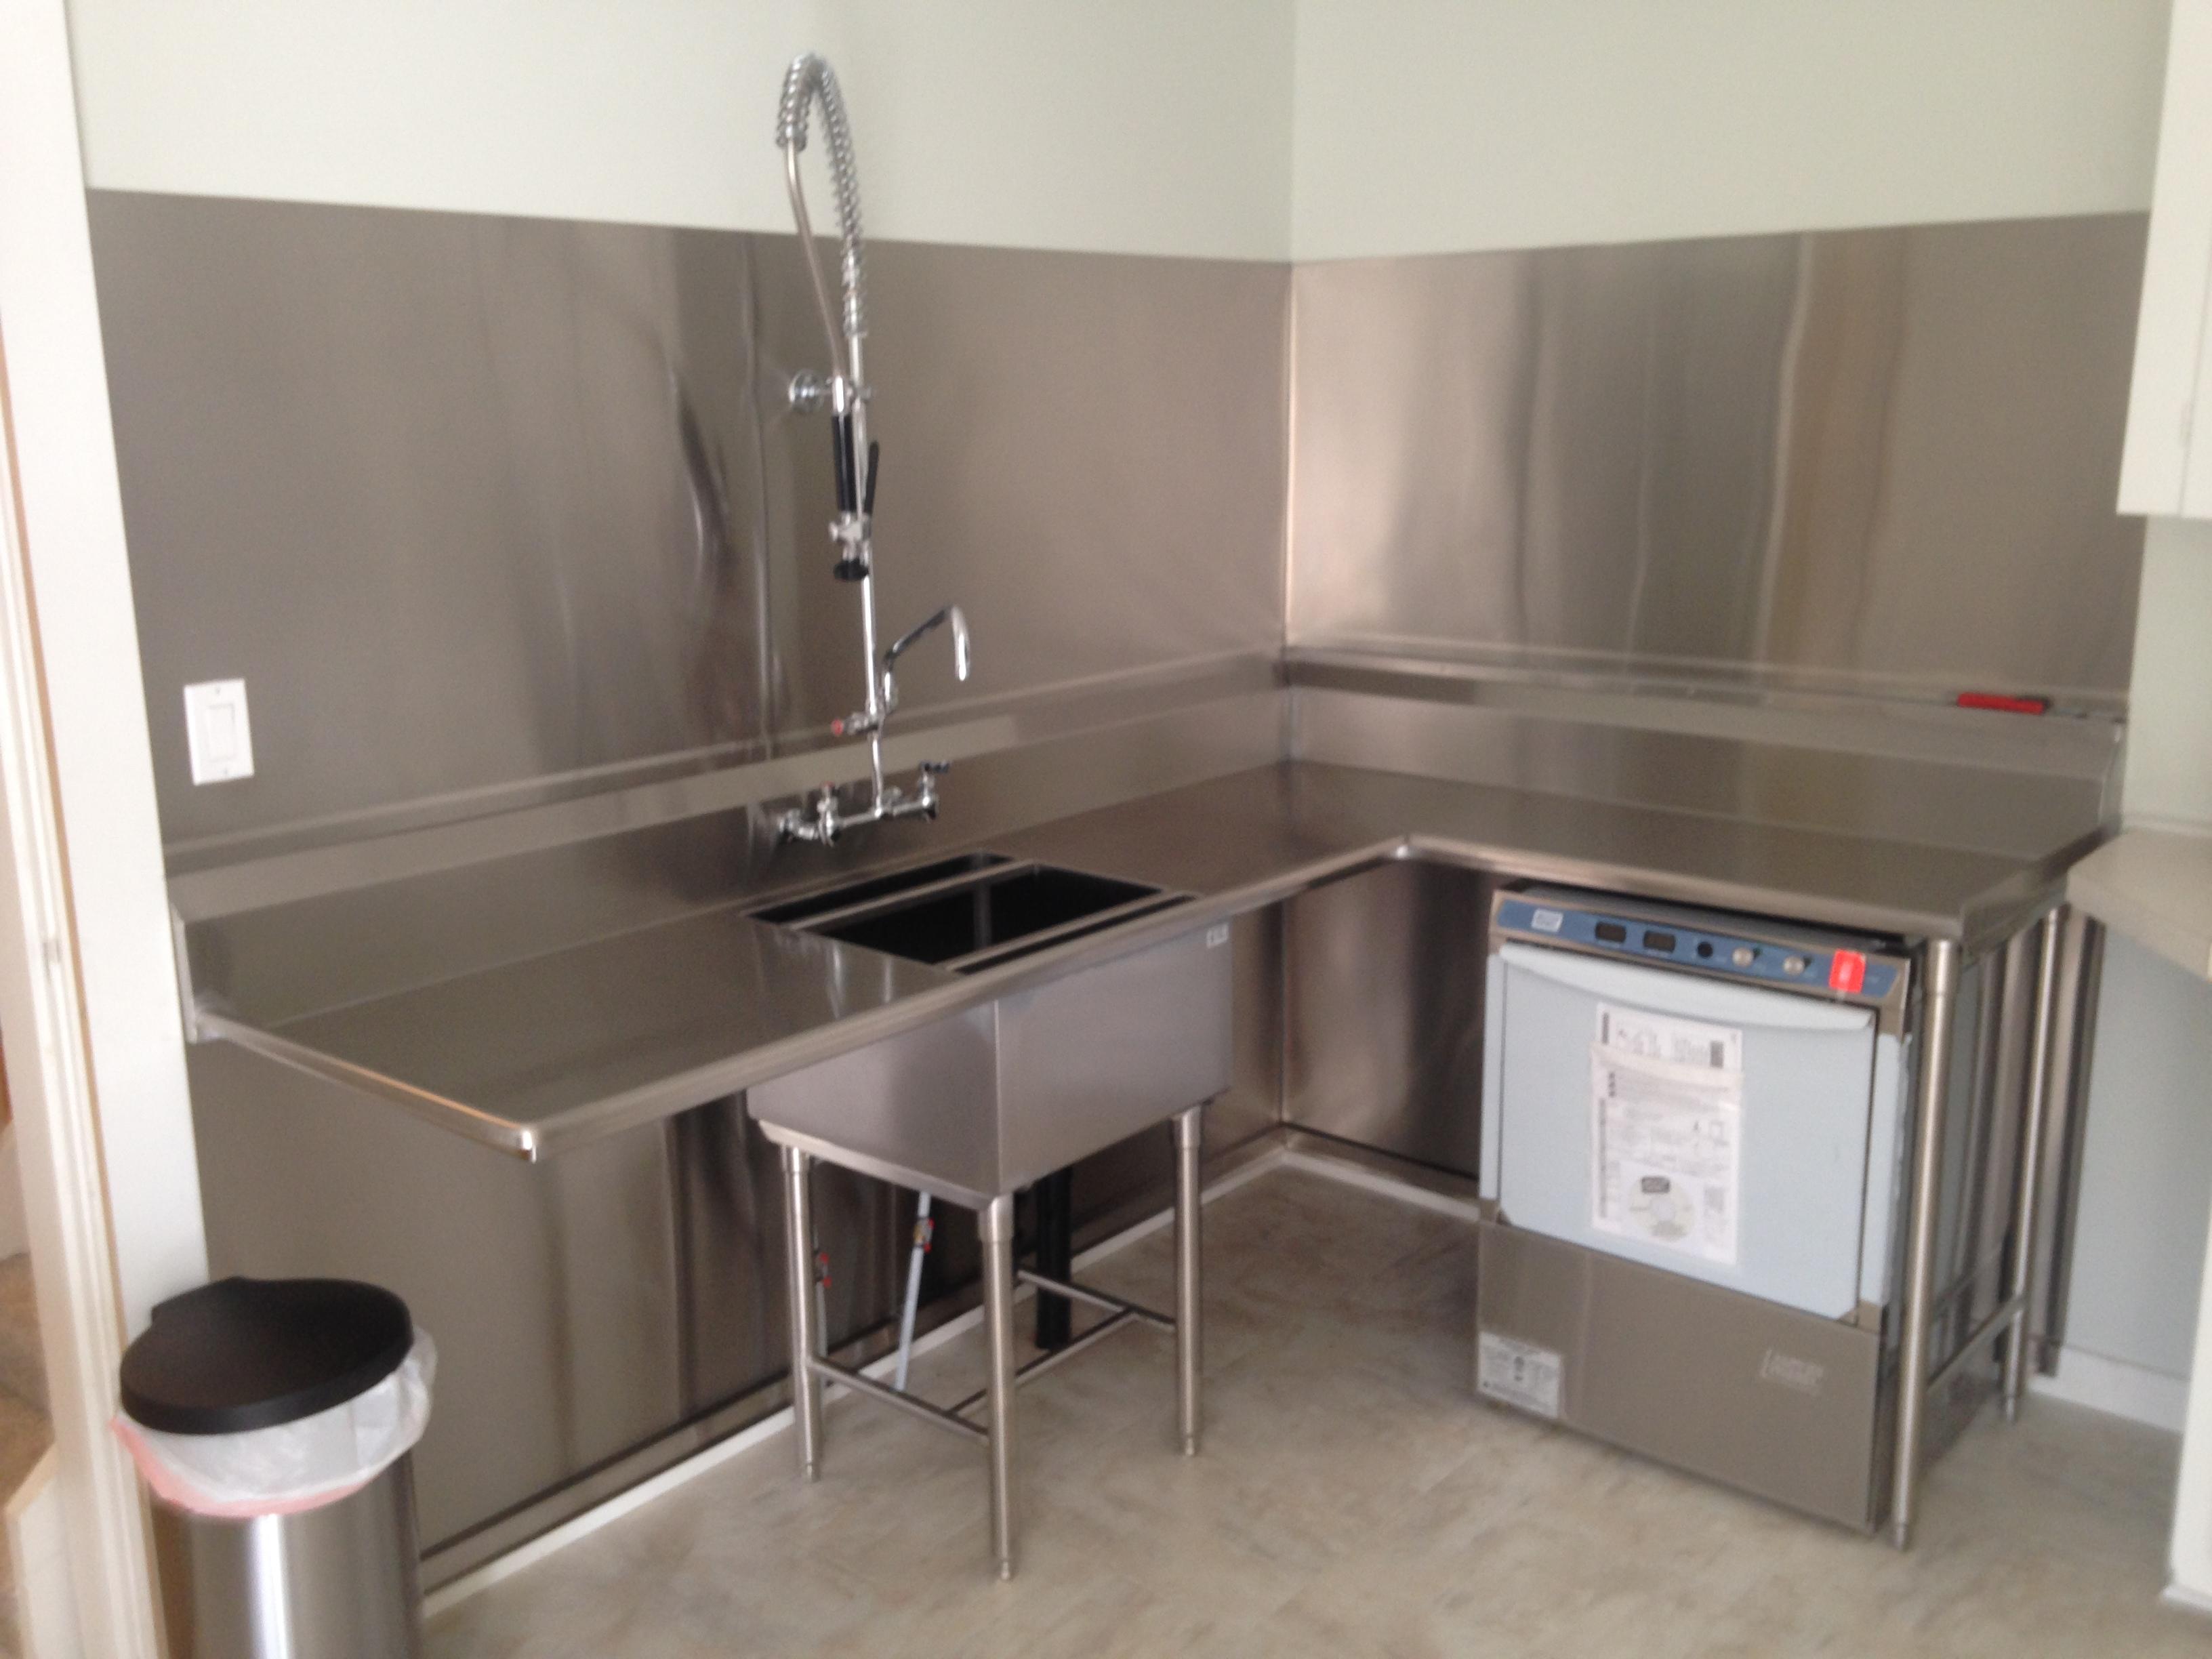 Stainless Steel Sinks Crest Sheet Metal